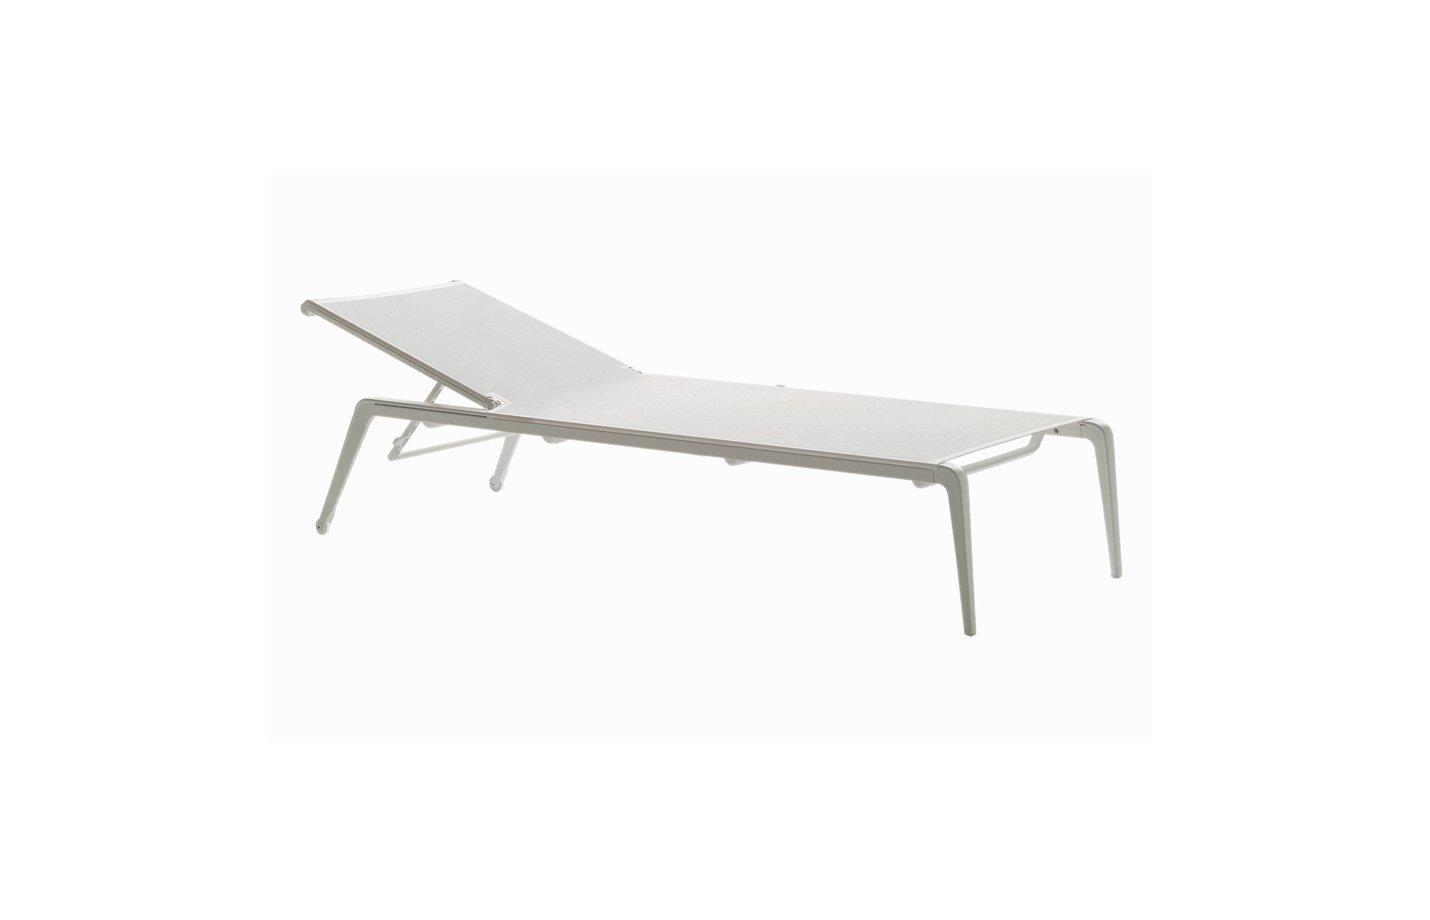 USHUAIA Sunlounger – Aluminium-white